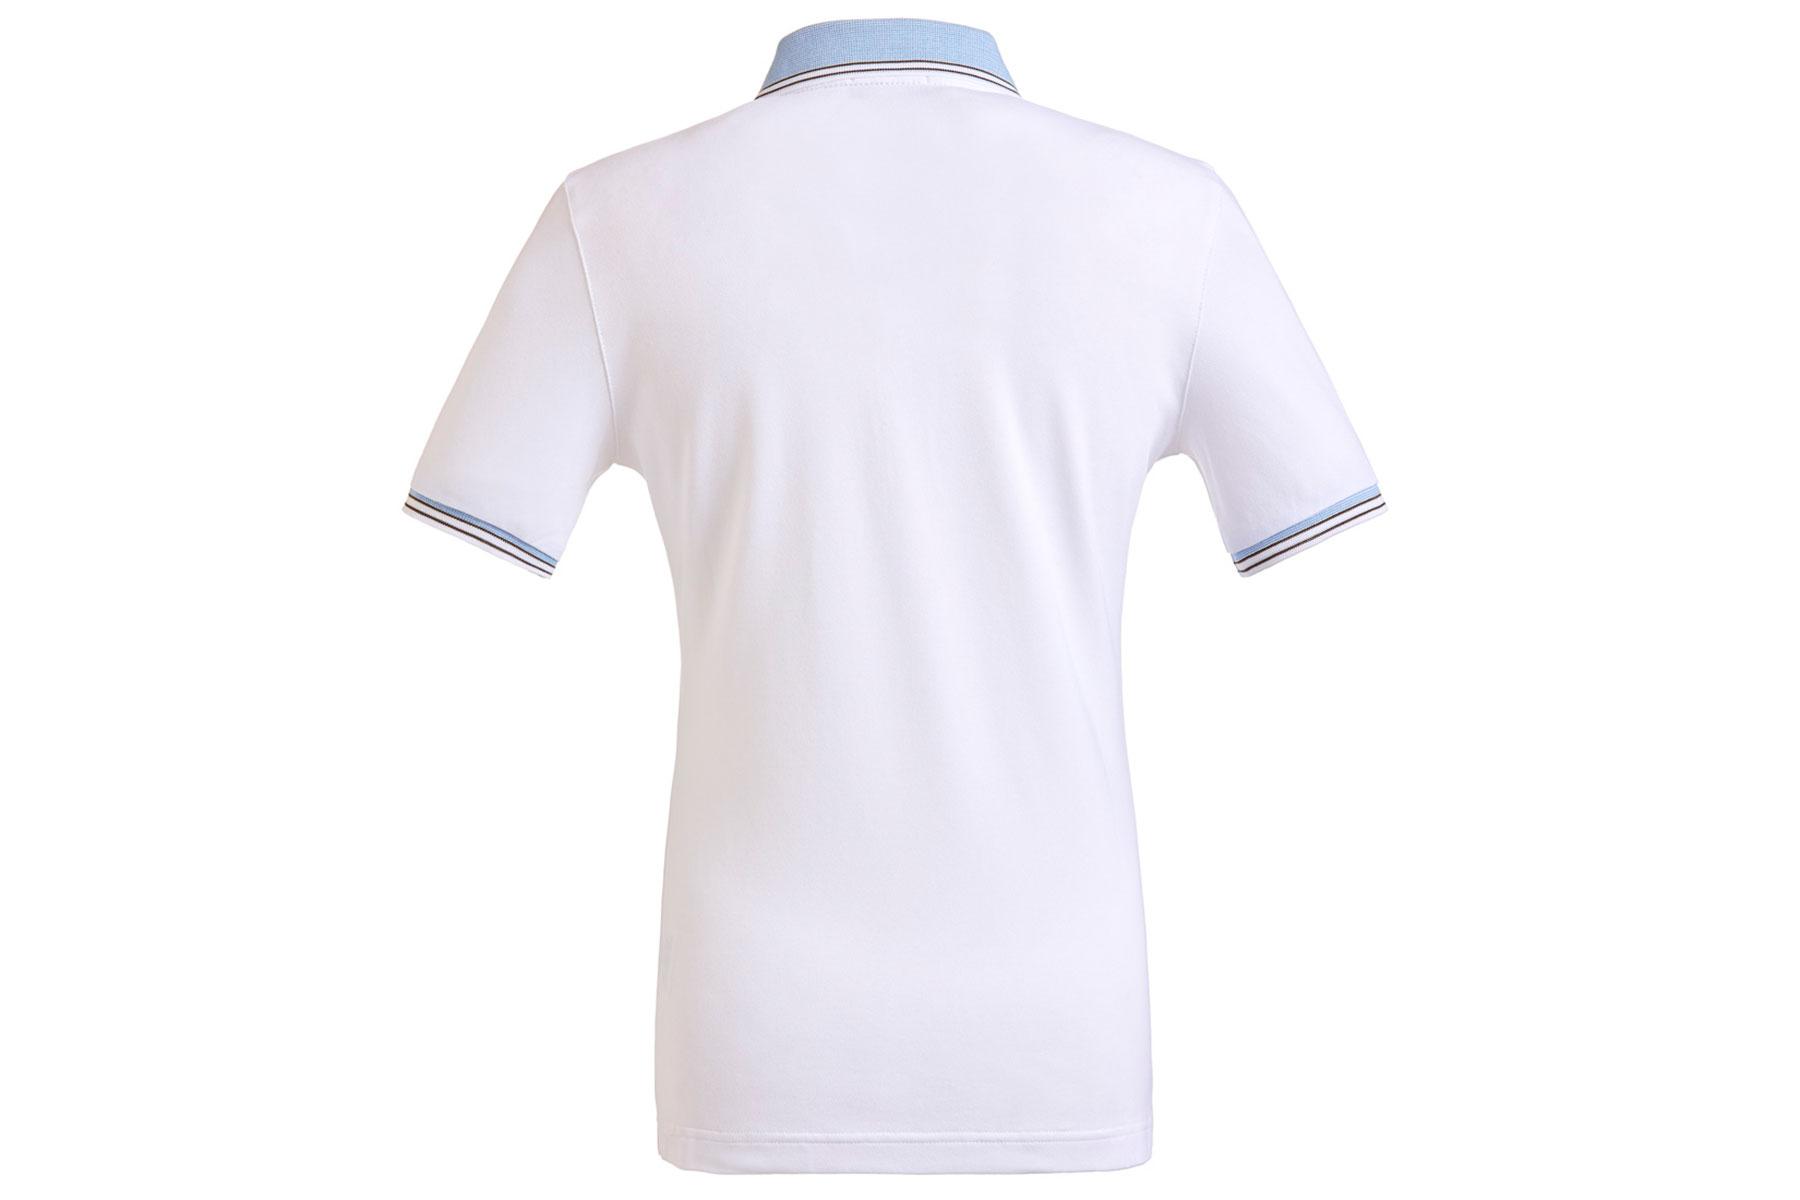 Golfino ladies sun protection short sleeve polo shirt for Sun protection golf shirts